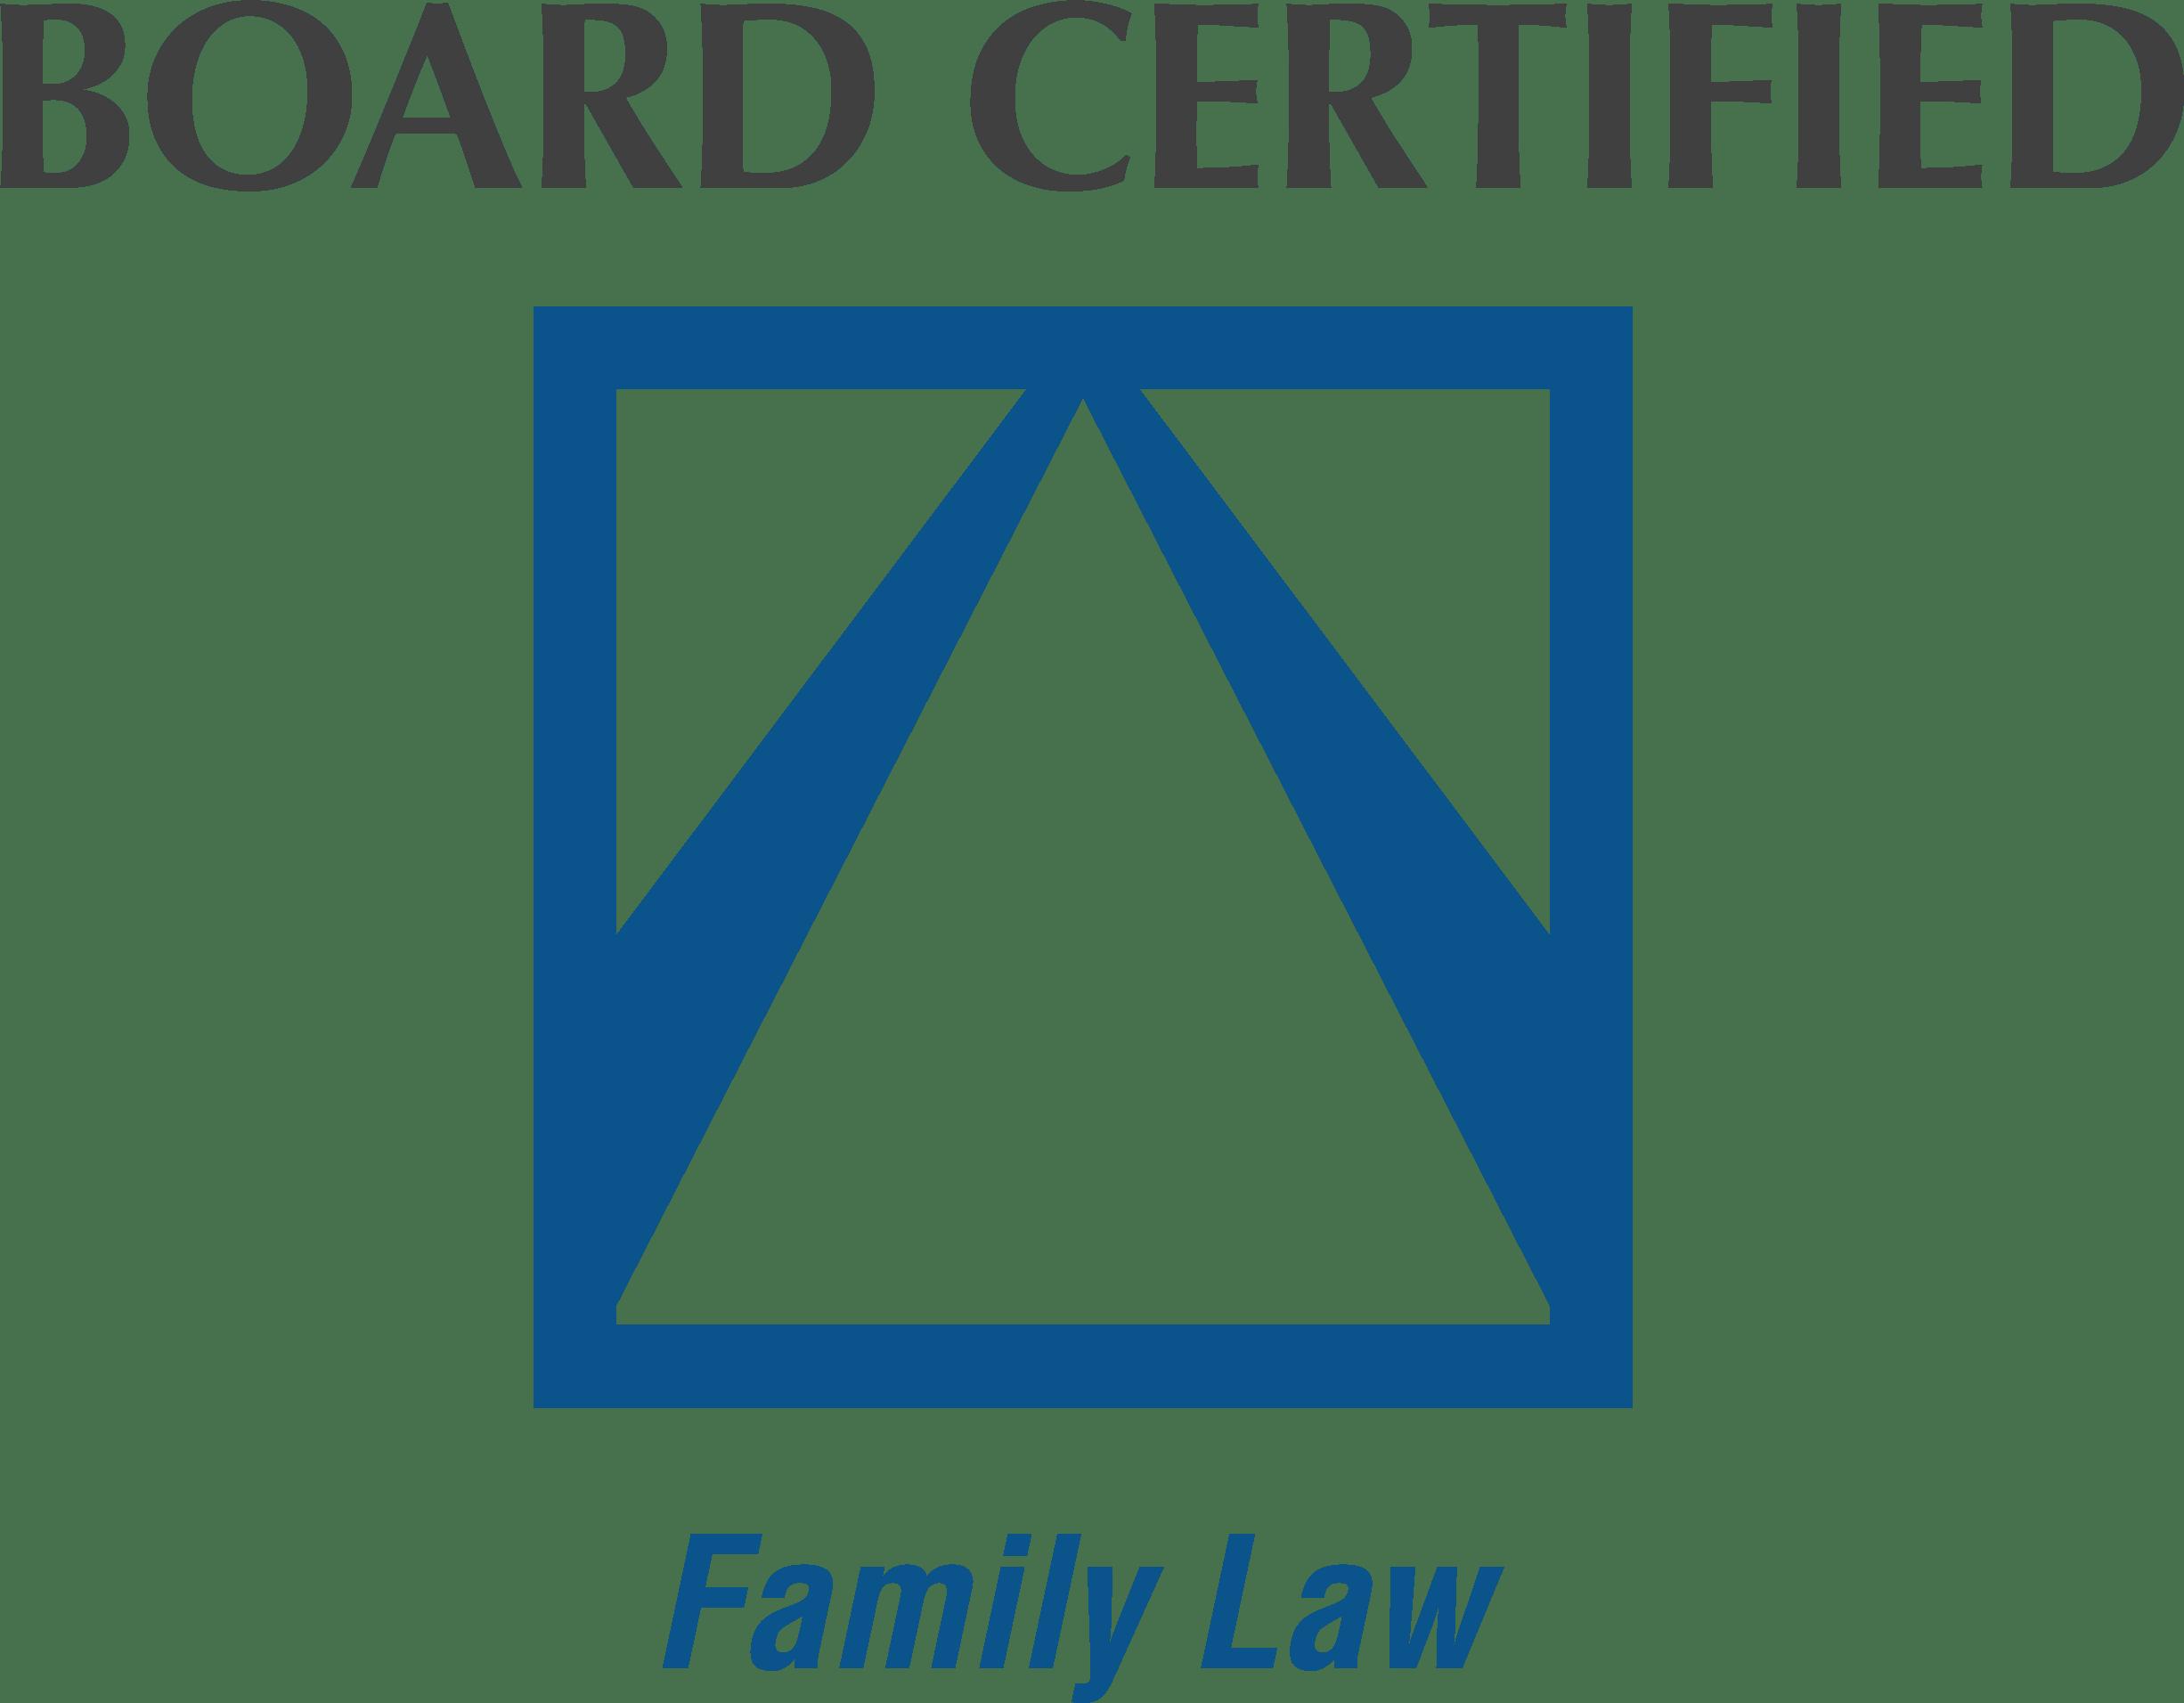 board cerified family law